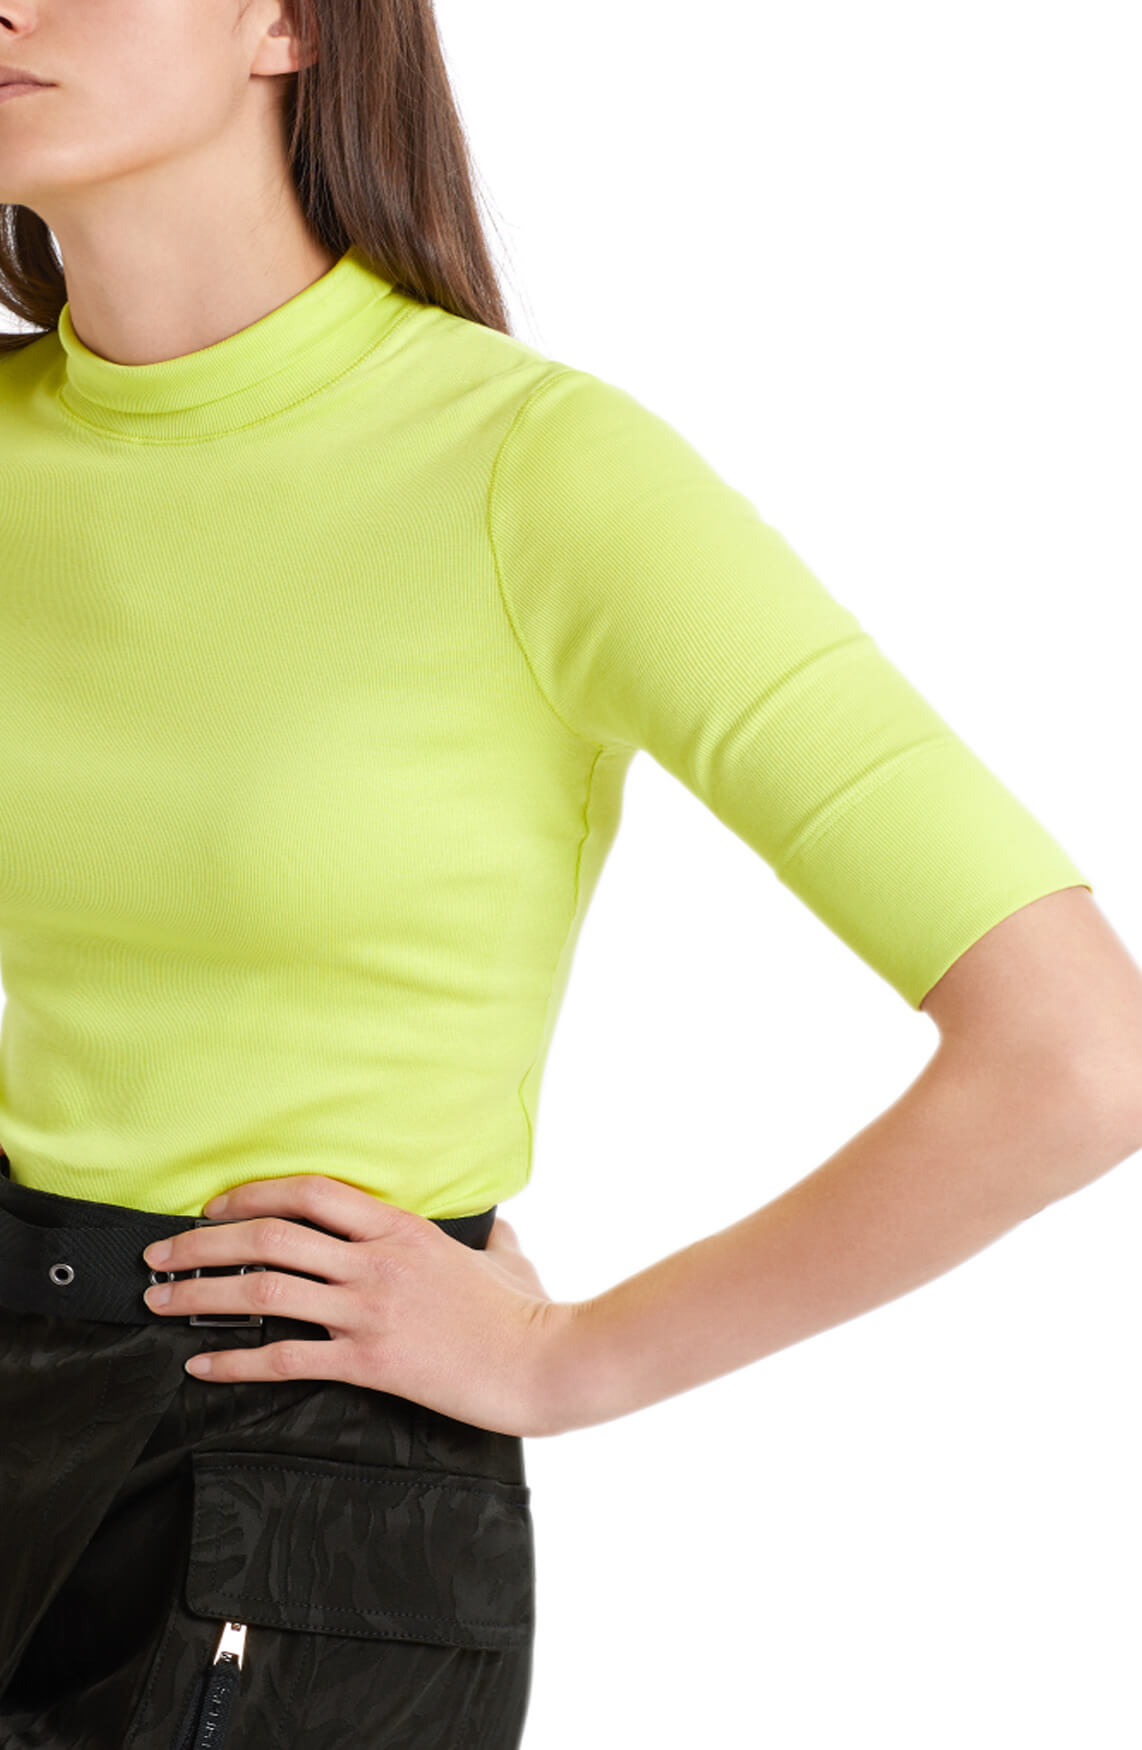 Marccain Sports Dames Shirt met colkraag geel